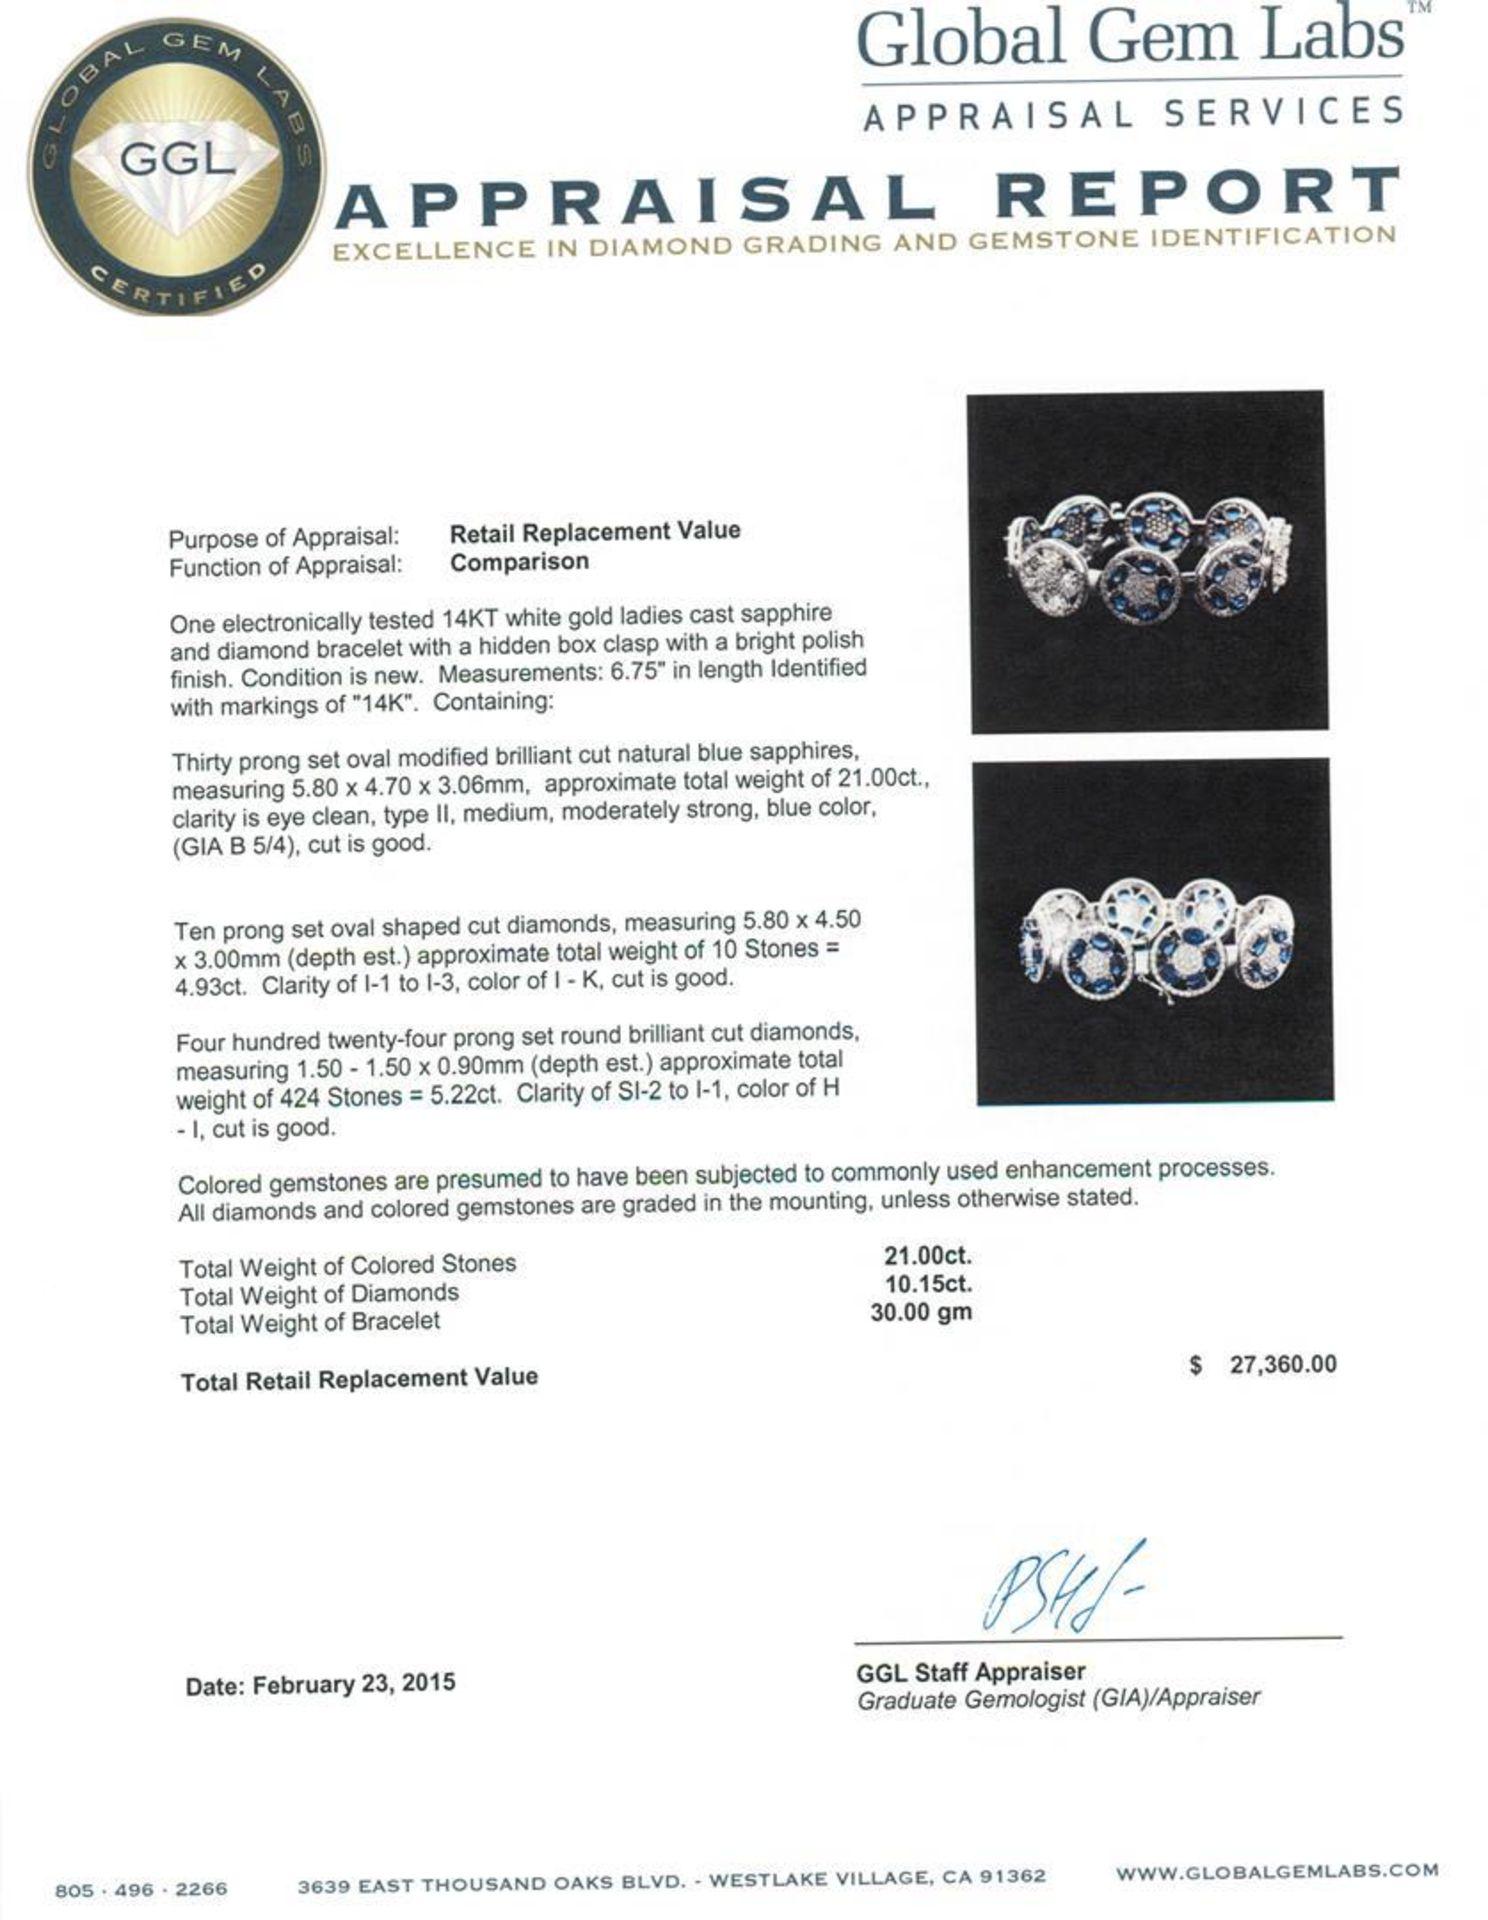 14KT White Gold 21.00 ctw Sapphire and Diamond Bracelet - Image 4 of 4